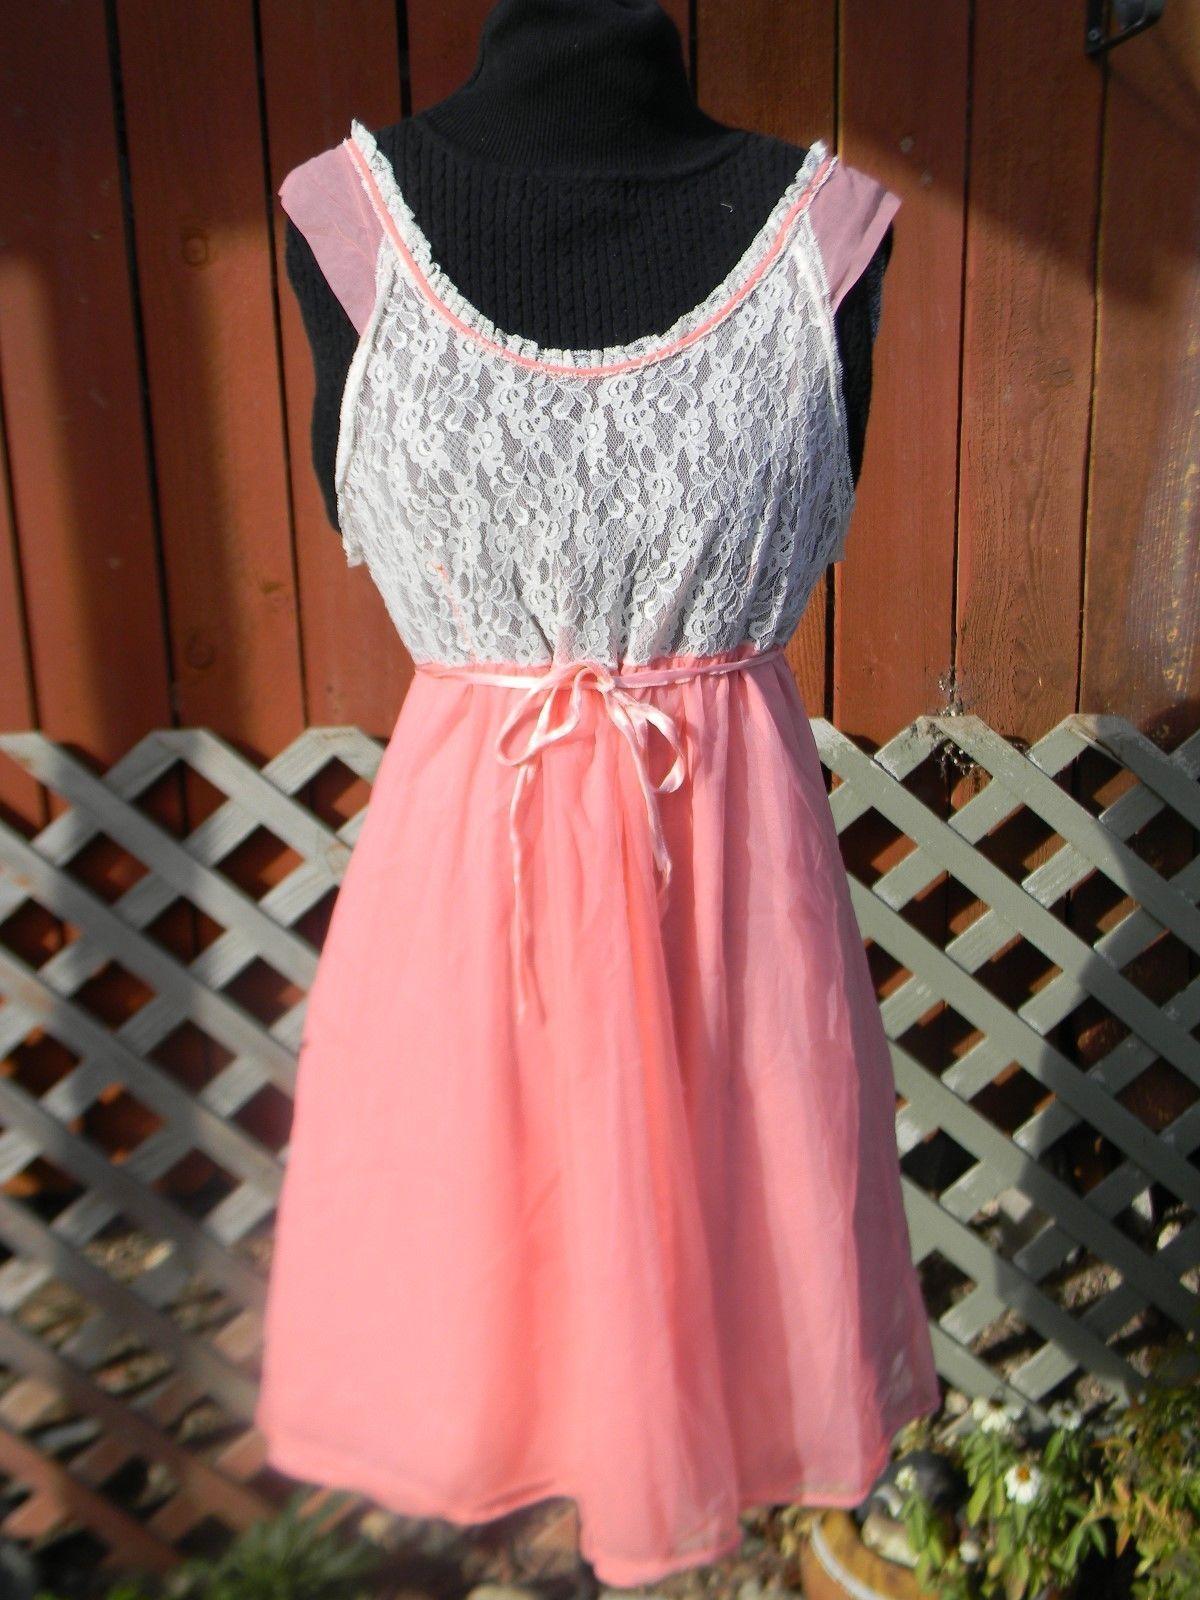 615356923c45 Pink White Chiffon Nightgown Peignoir Negligee Babydoll Gown Medium ...